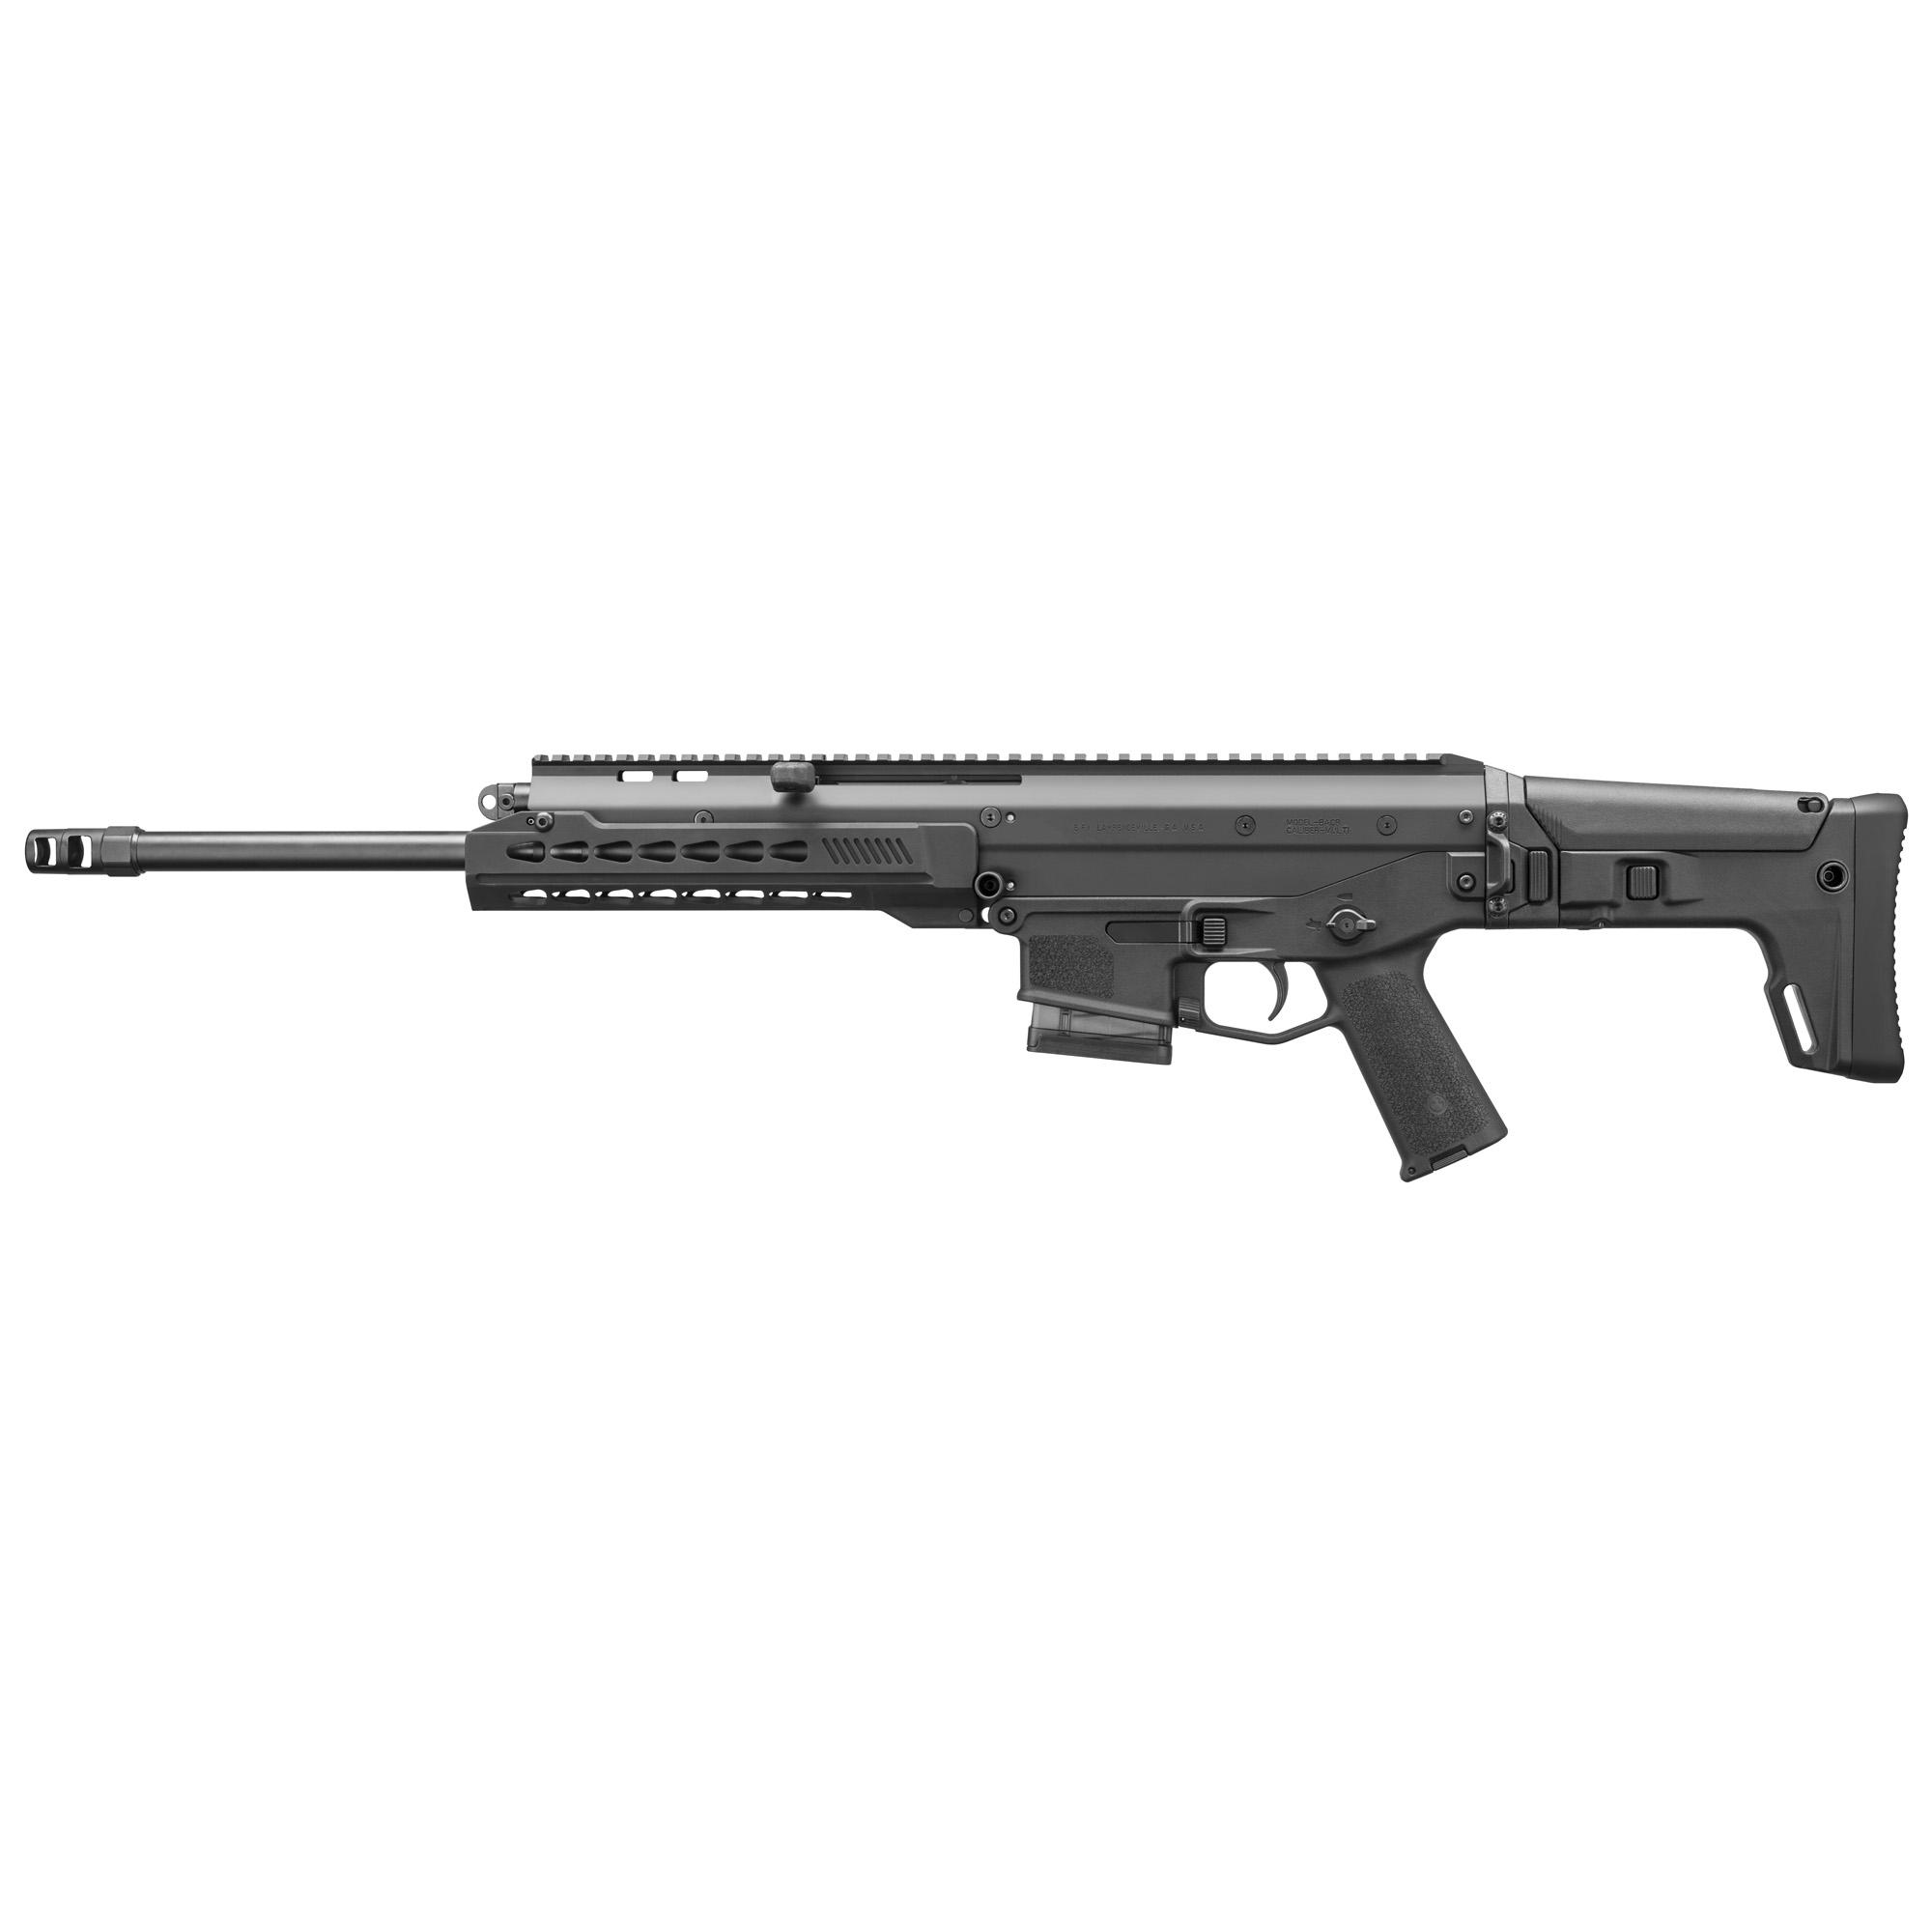 Bushmaster ACR Enhanced AR 16.5″ 450 Bushmaster 5Rd – Black